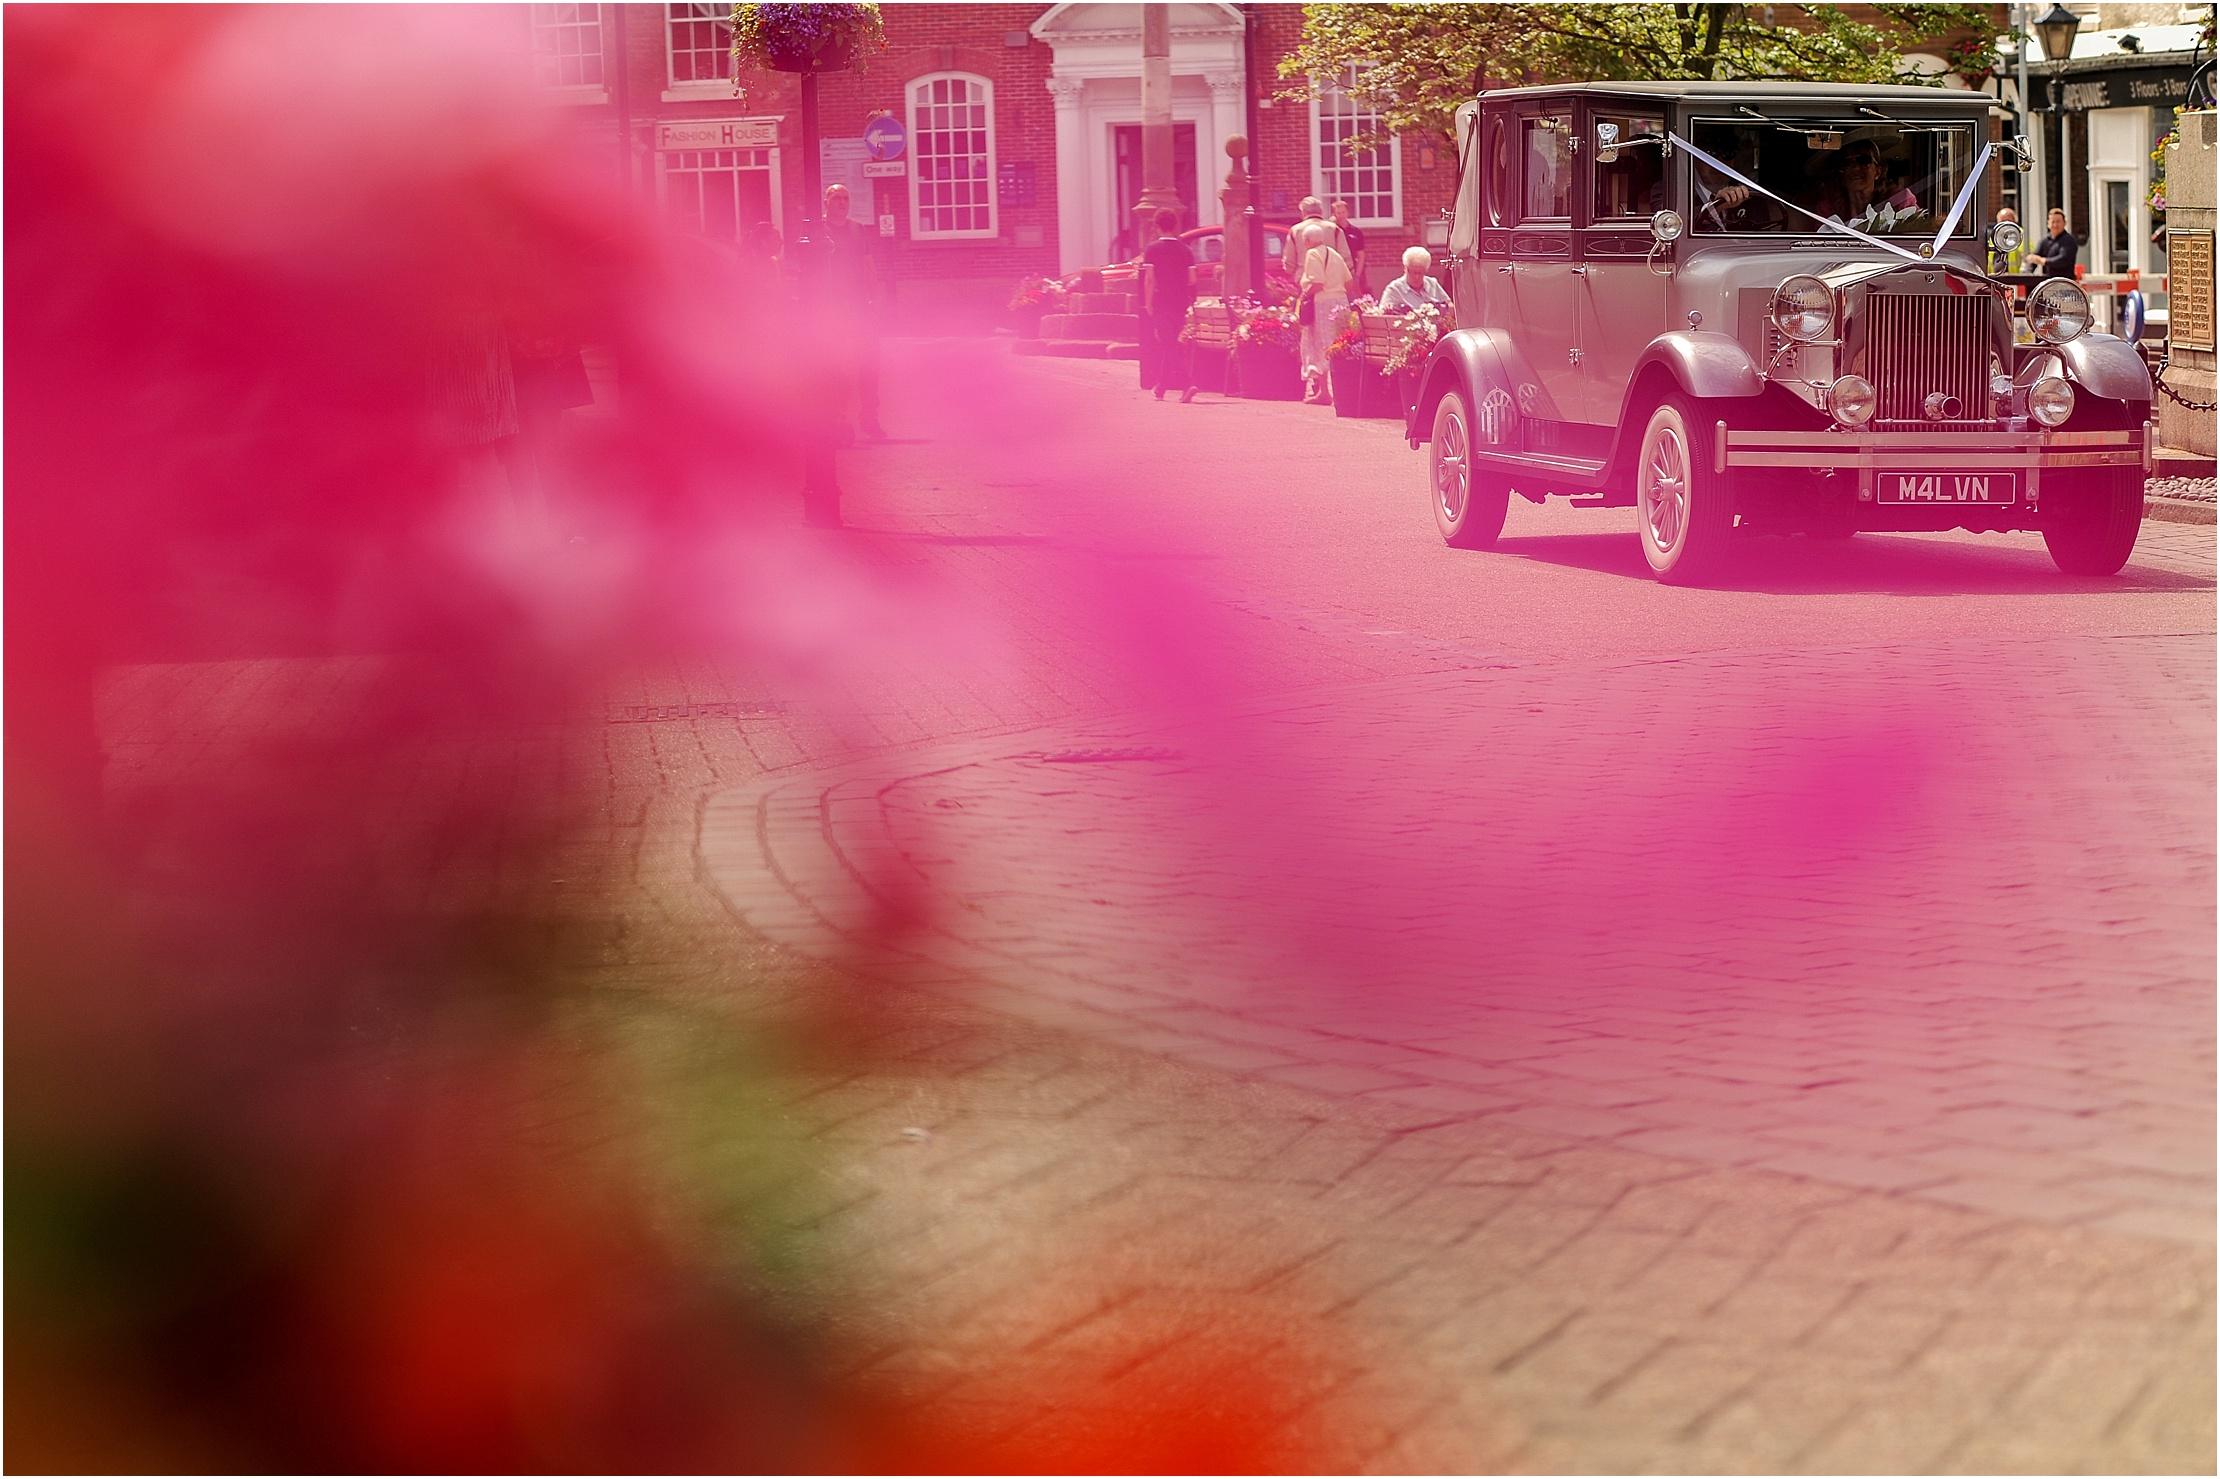 ashton-hall-wedding - 039.jpg